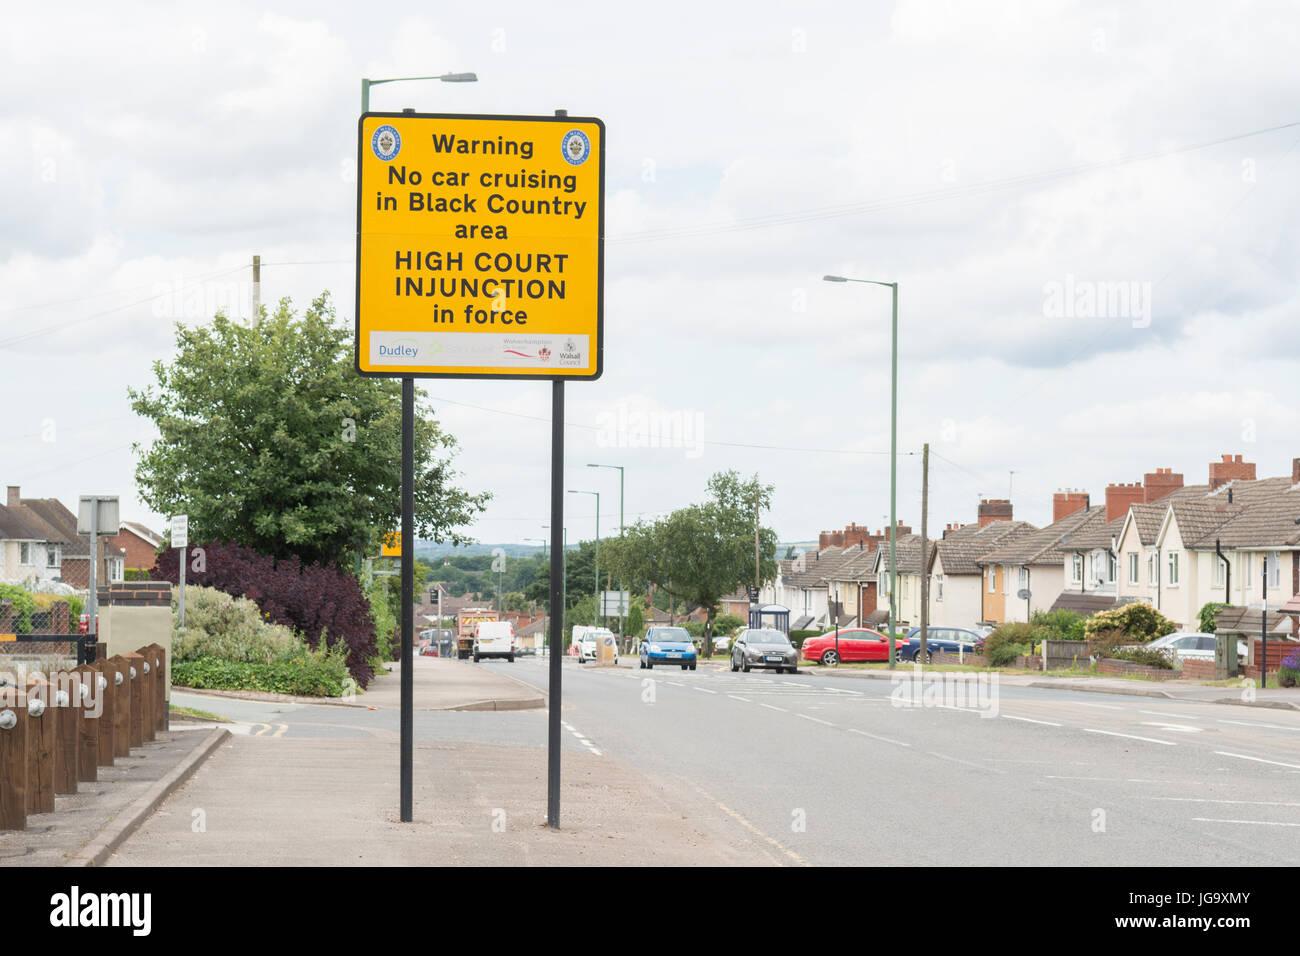 Car cruising ban sign, Brownhills, Walsall, England, UK - Stock Image